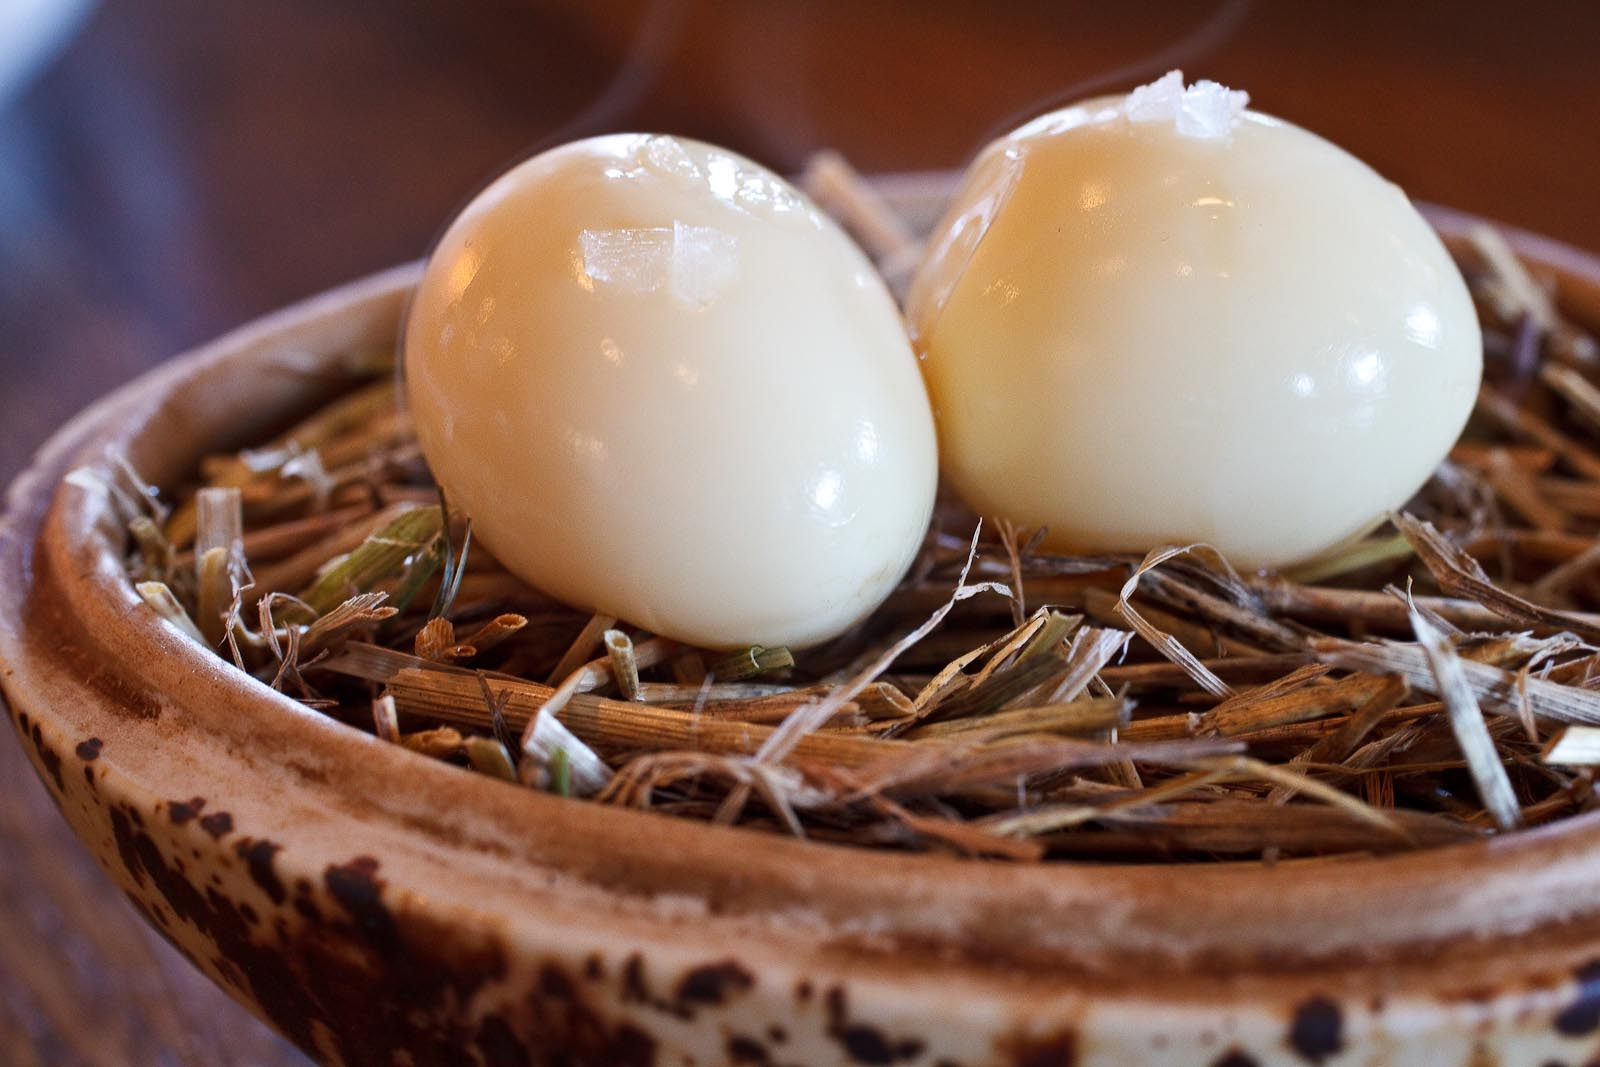 Noma - Amuse bouche - Smoked quail egg